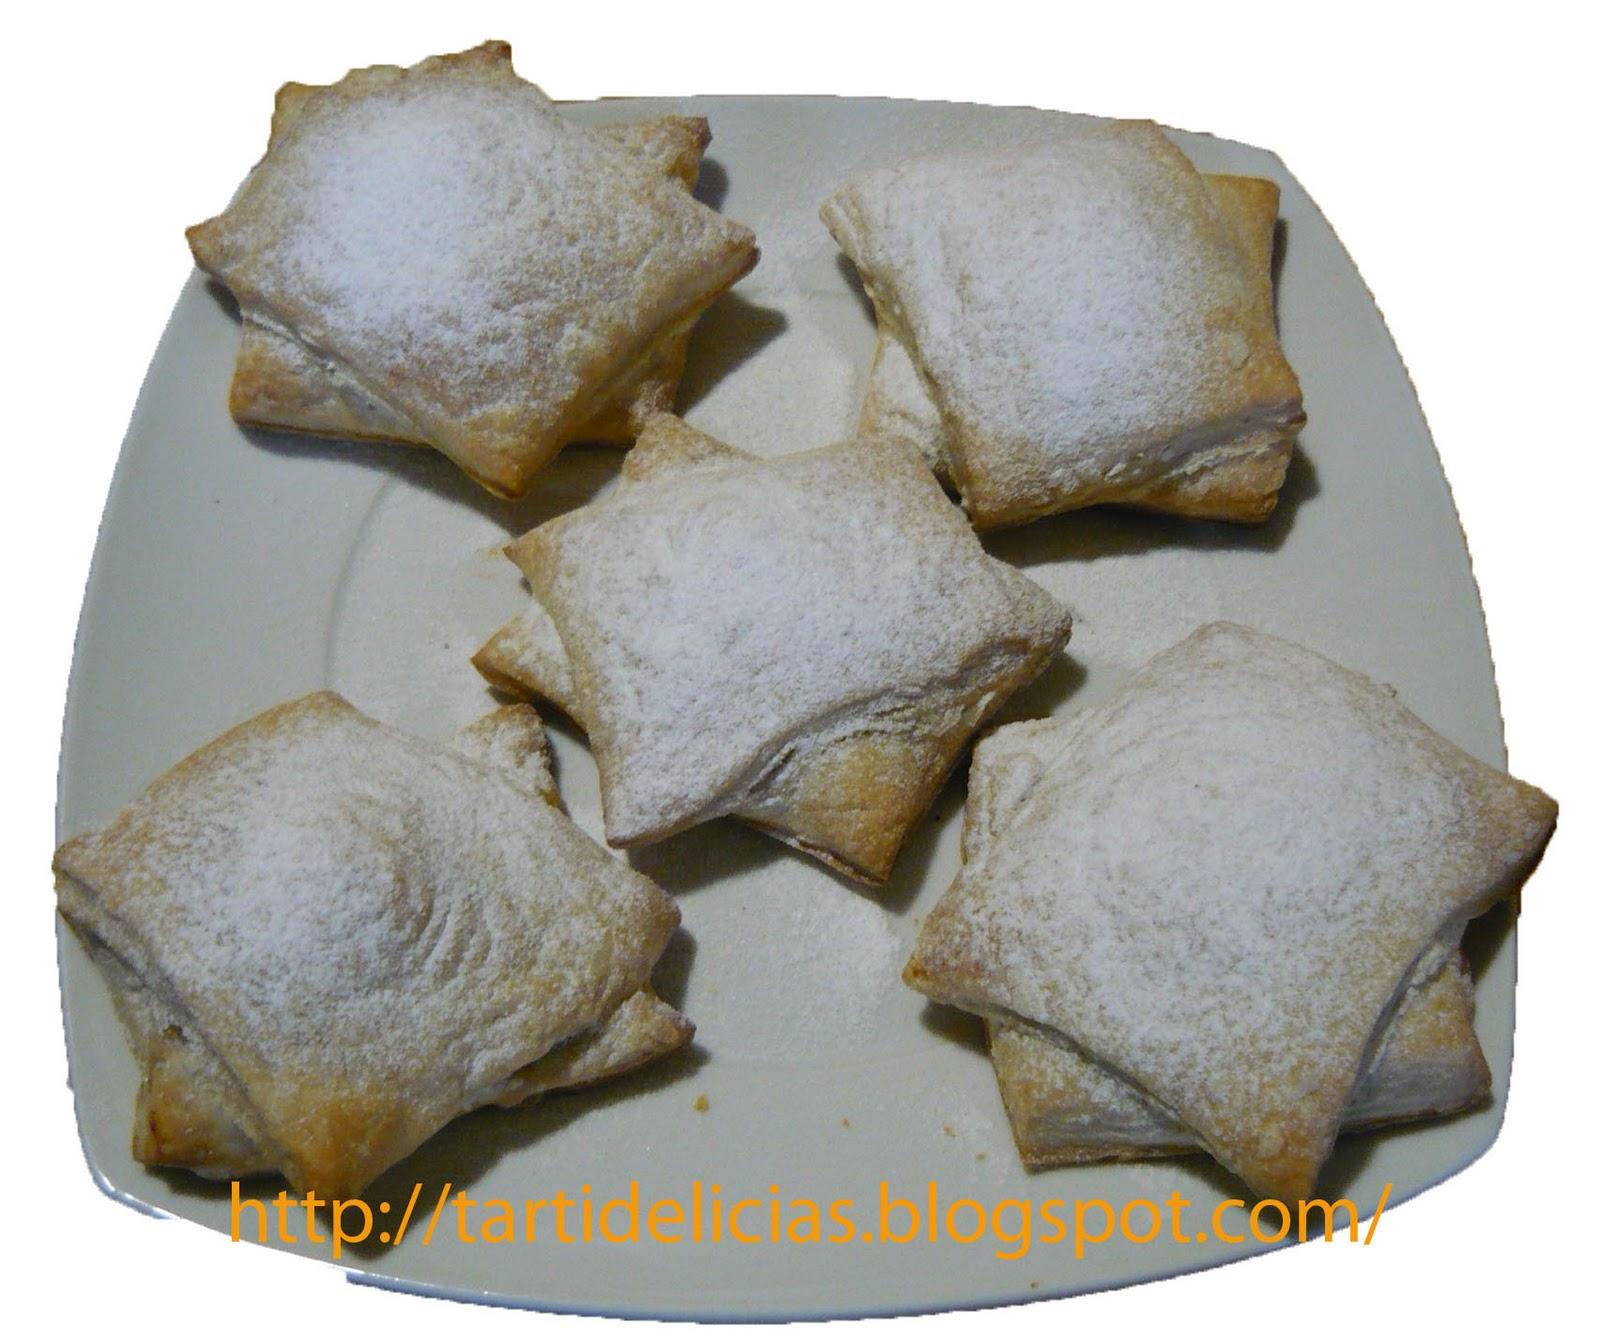 Tartidelicias pastelitos criollos con dulce de membrillo - Hacer membrillo casero ...